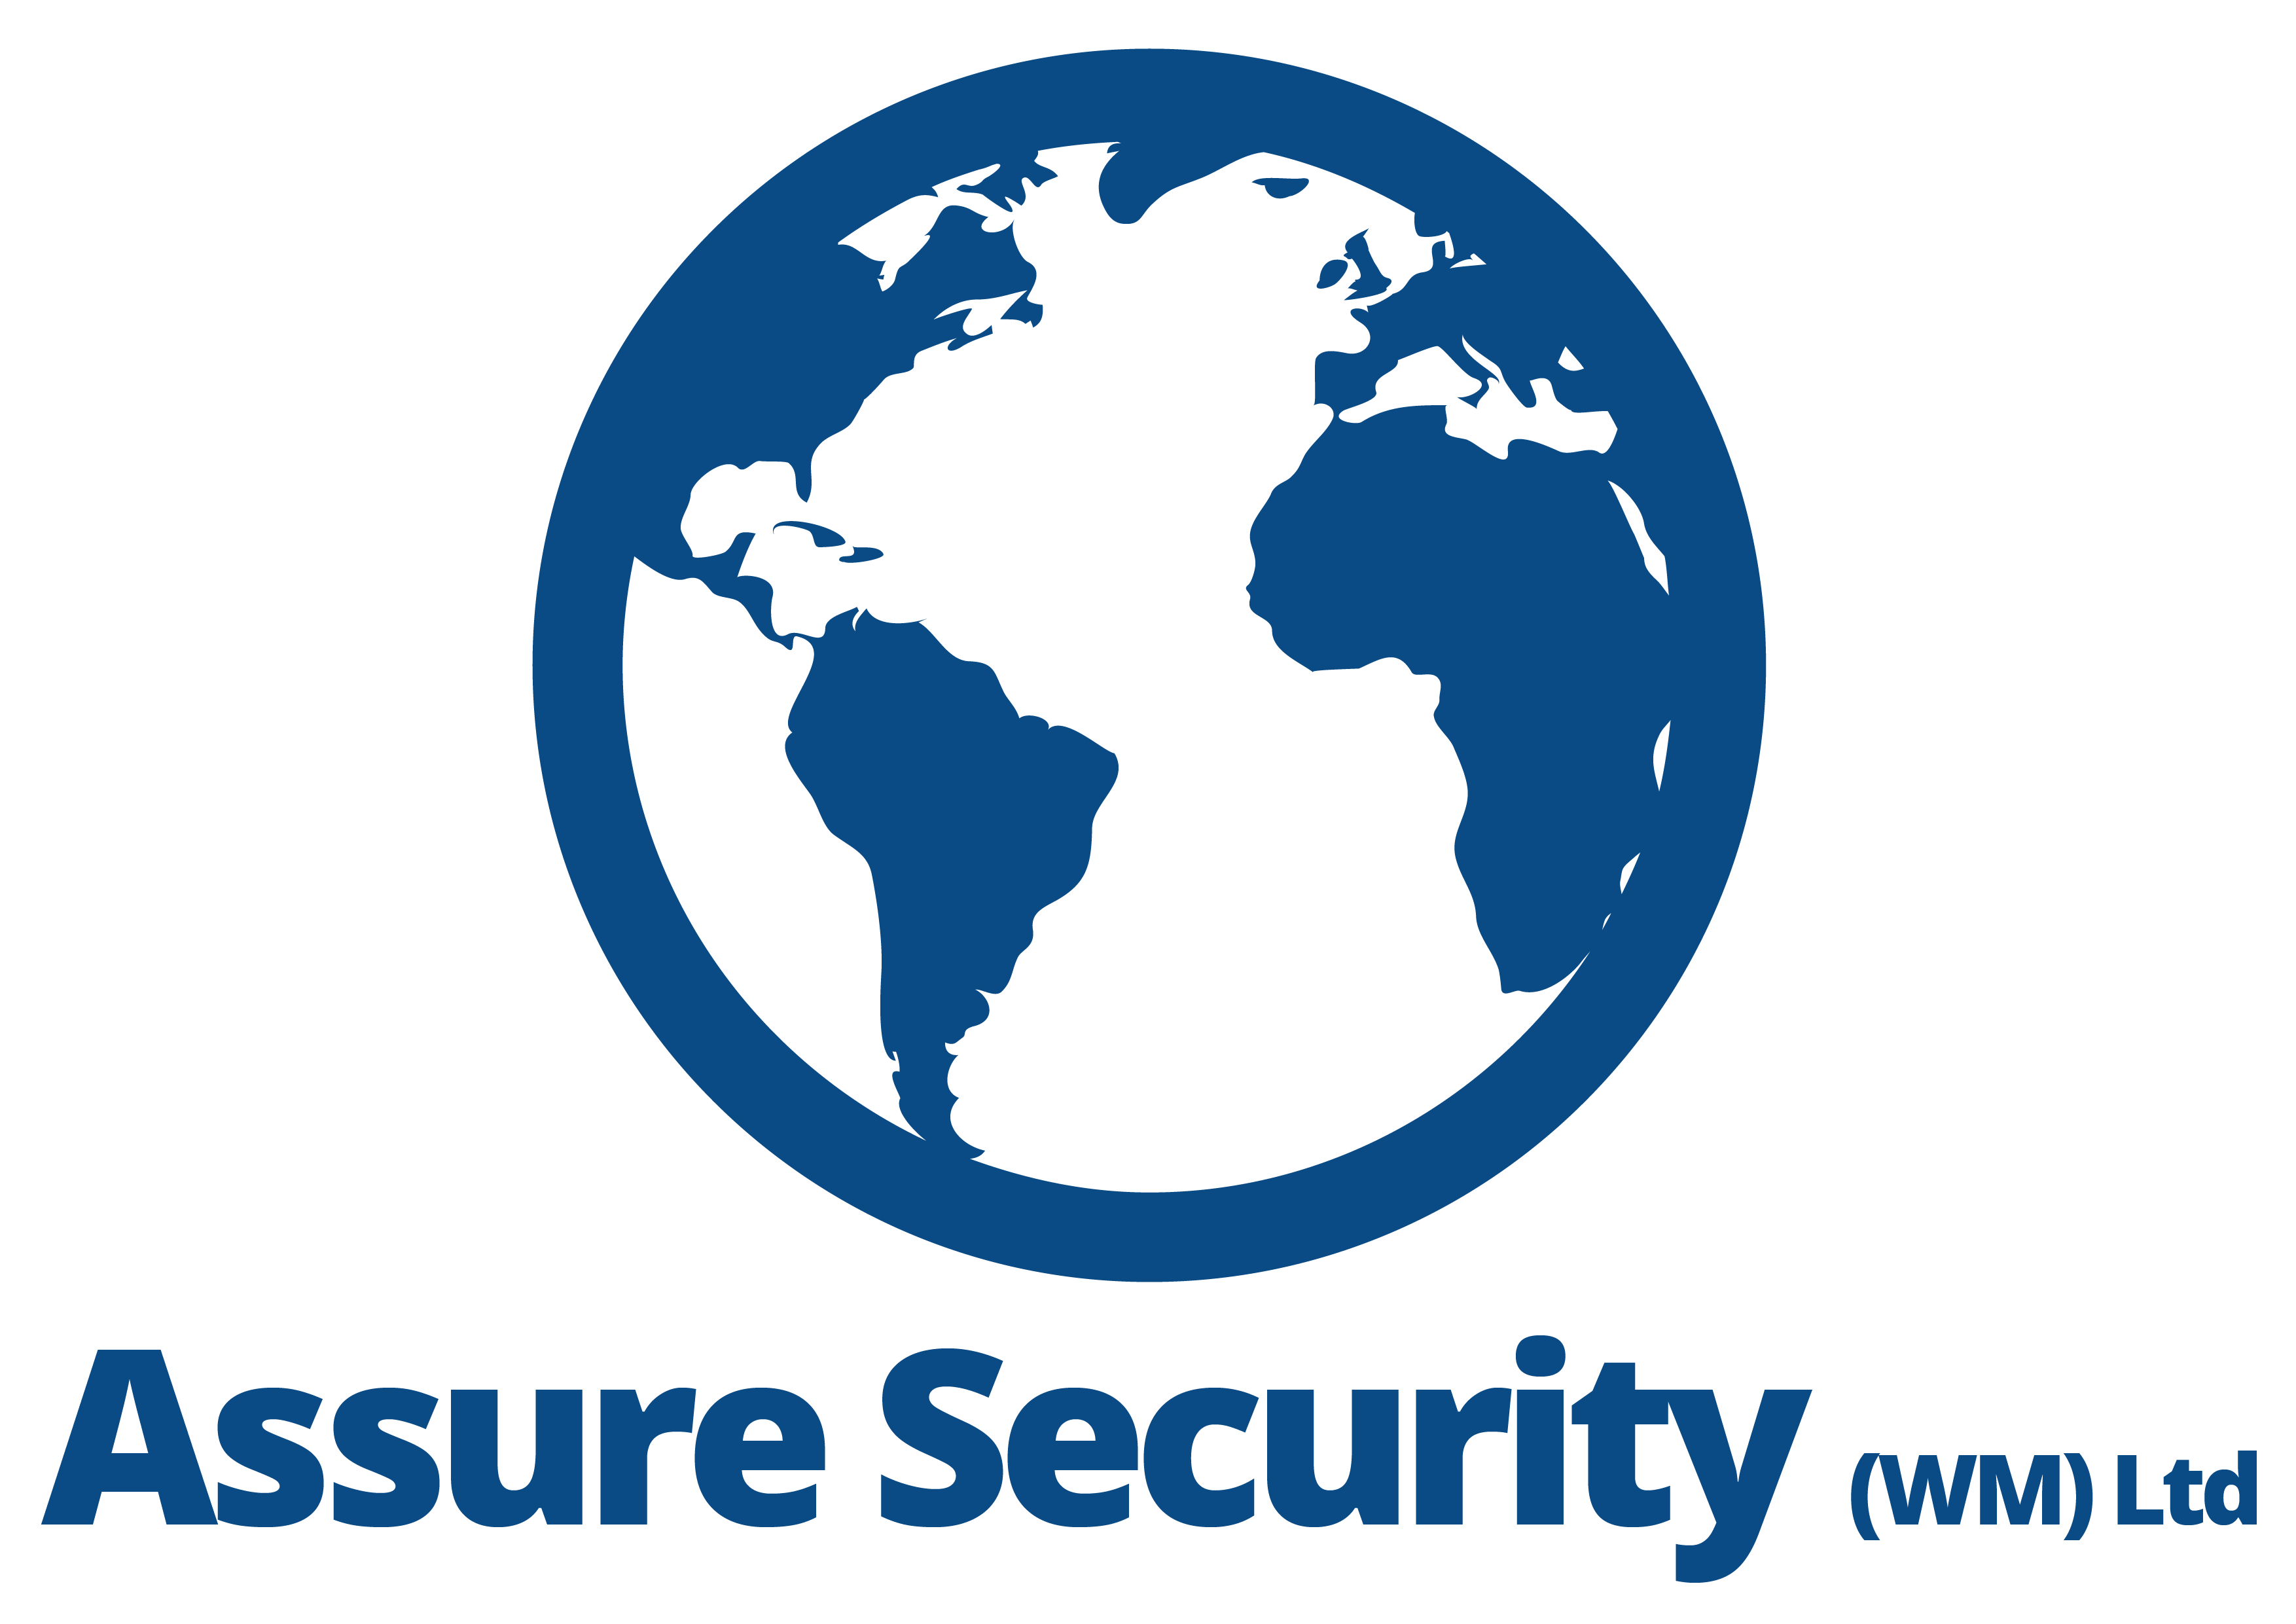 Assure Security